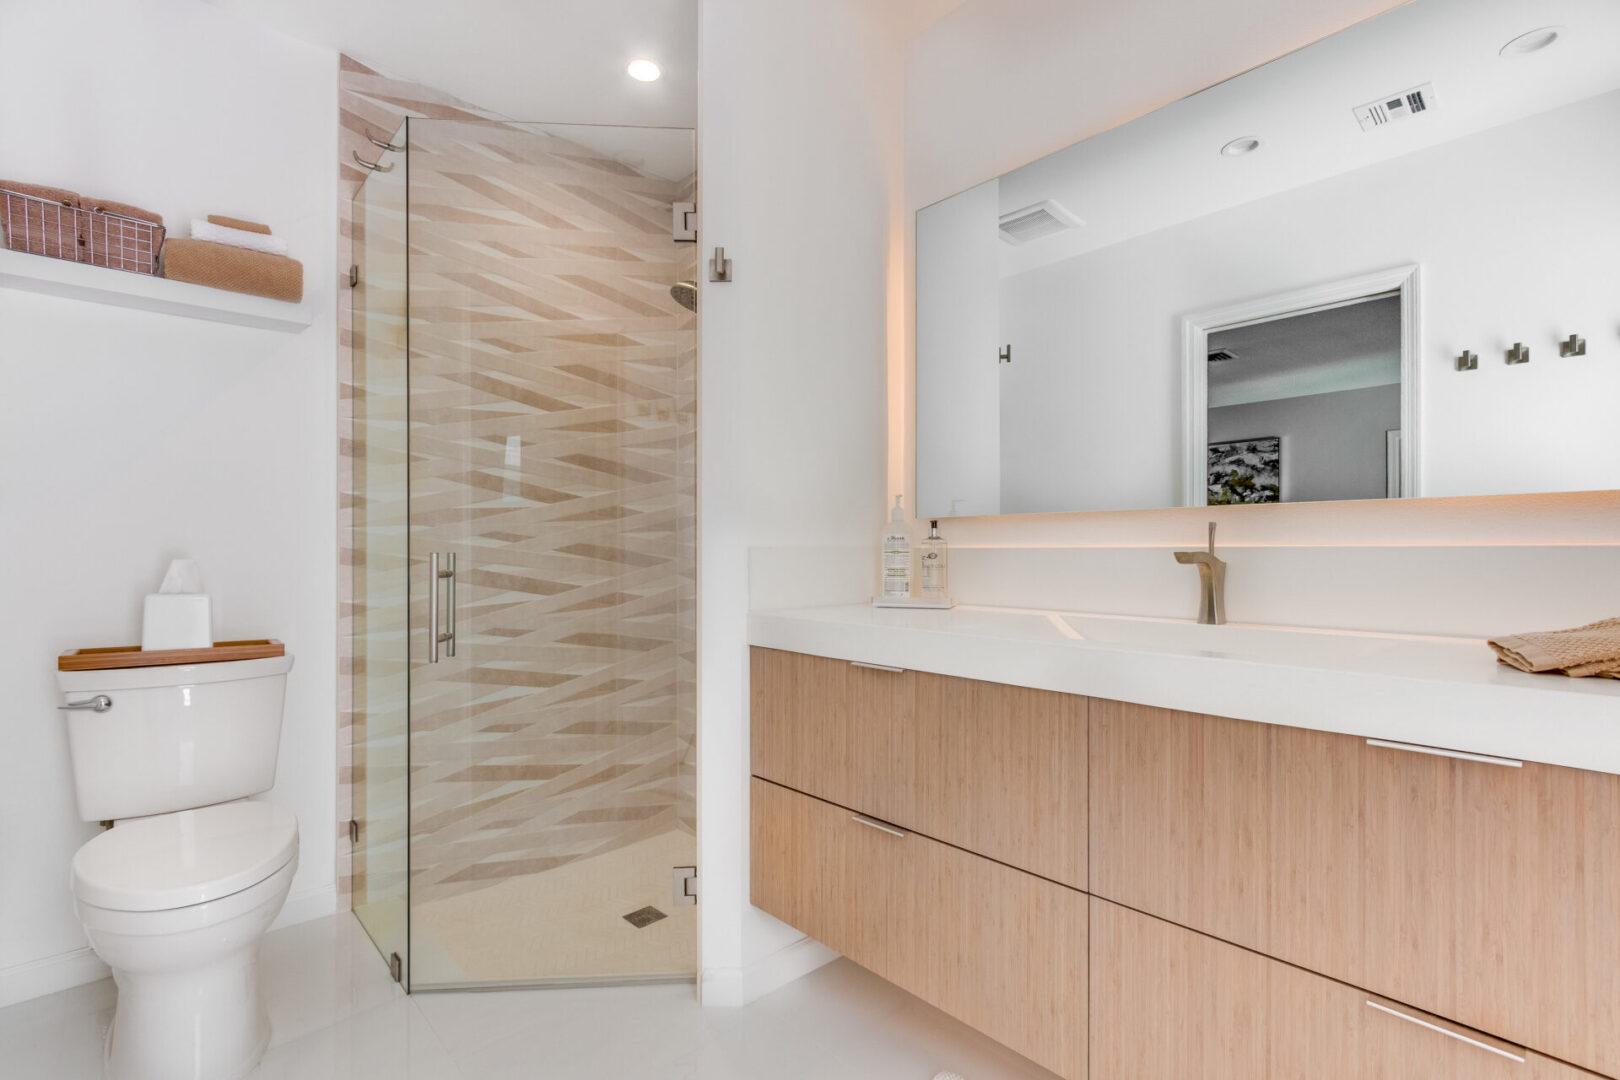 hahn1 bathroom